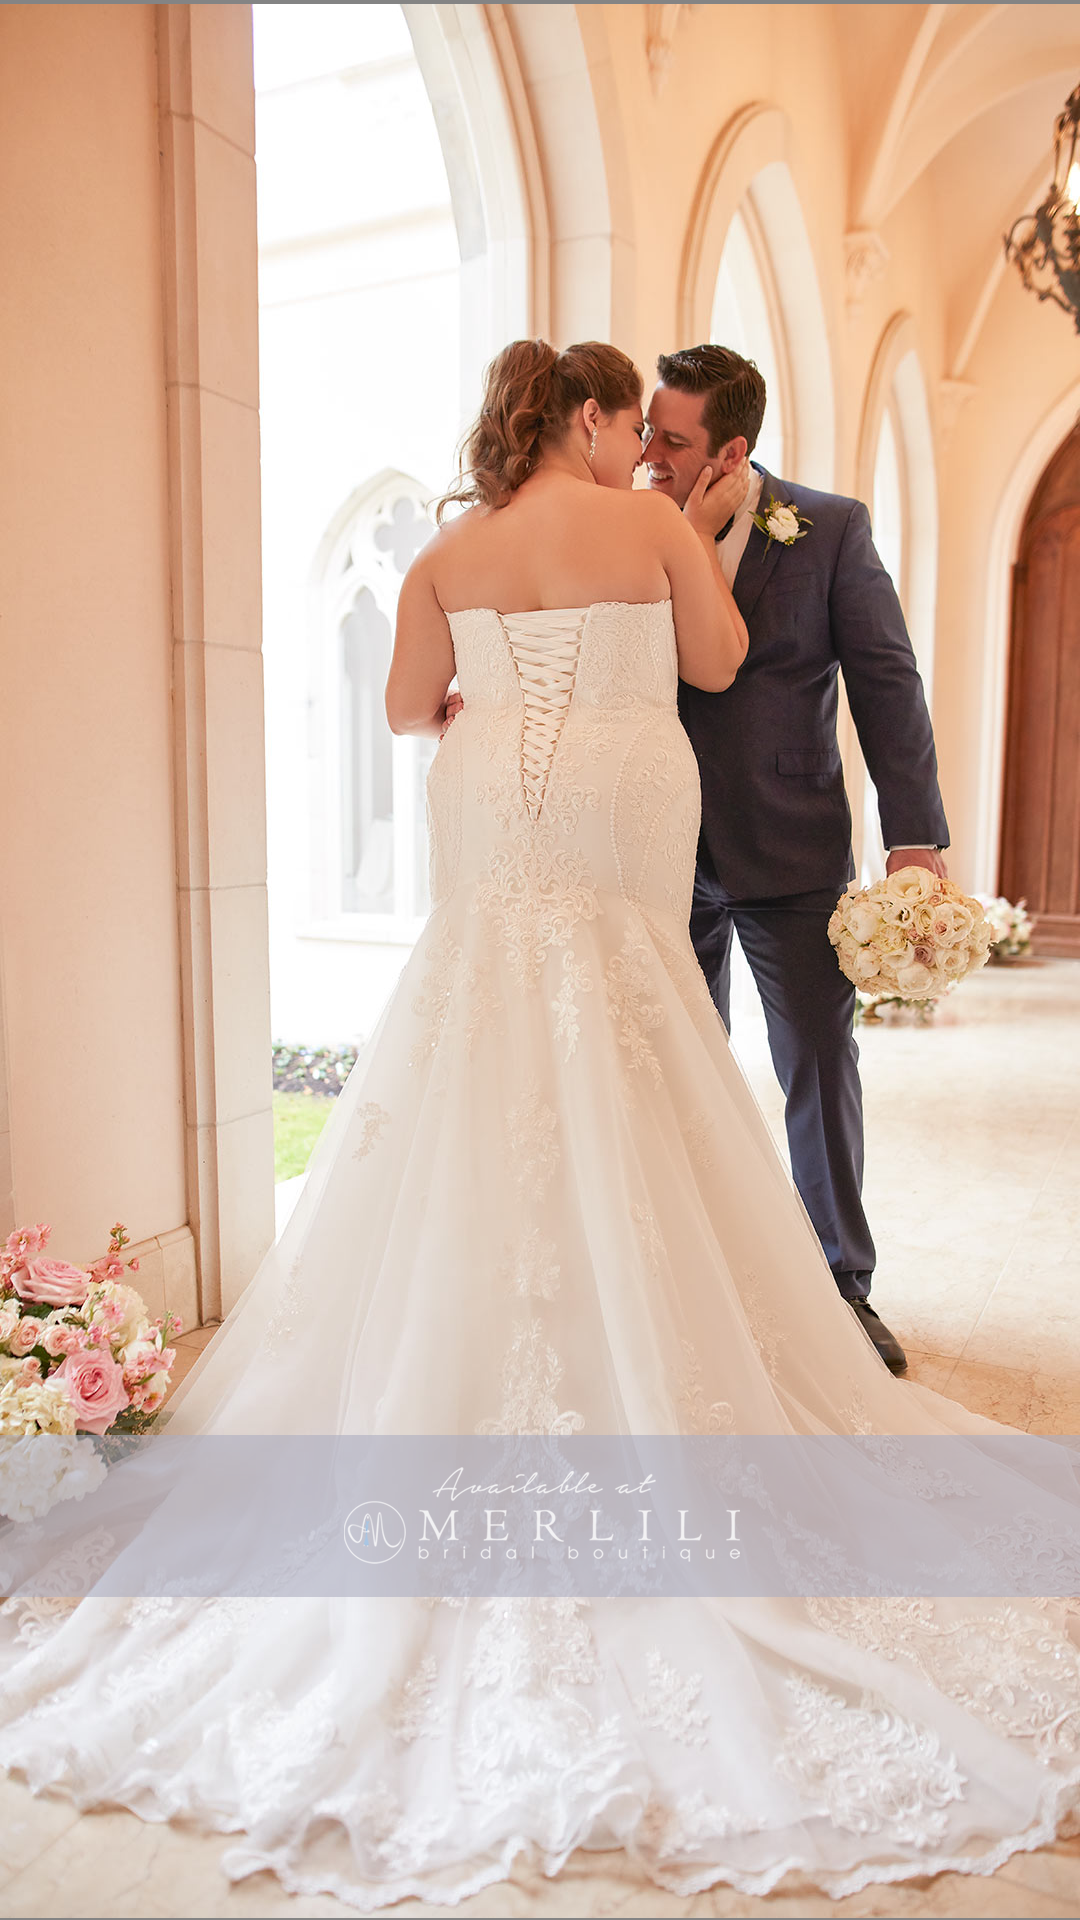 Pin On Plus Size Wedding Dresses At Merlili Miami